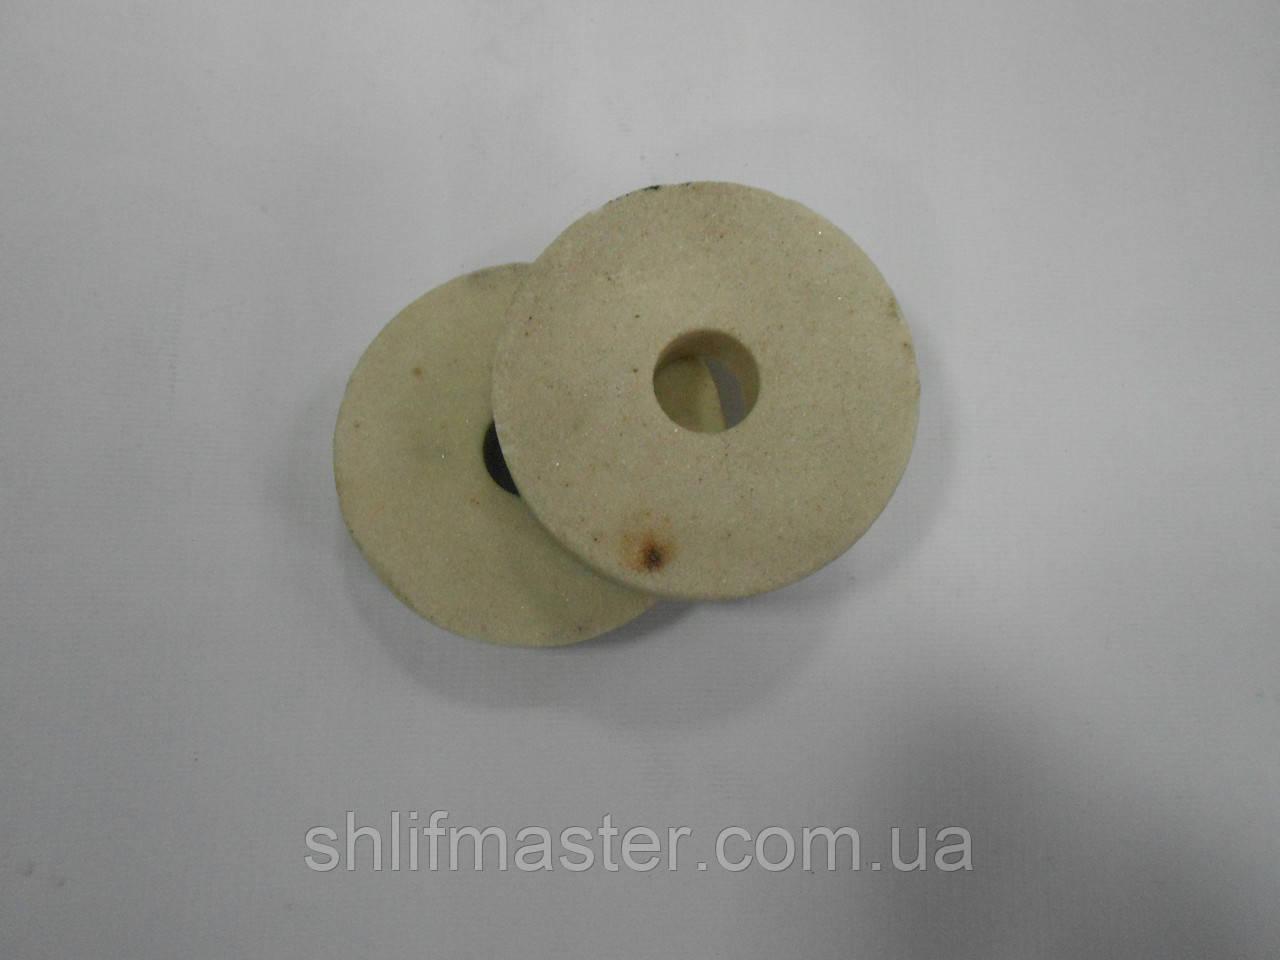 Абразивный круг шлифовальный (электрокорунд белый) 25А ПП 50Х40Х16 16-40 СМ